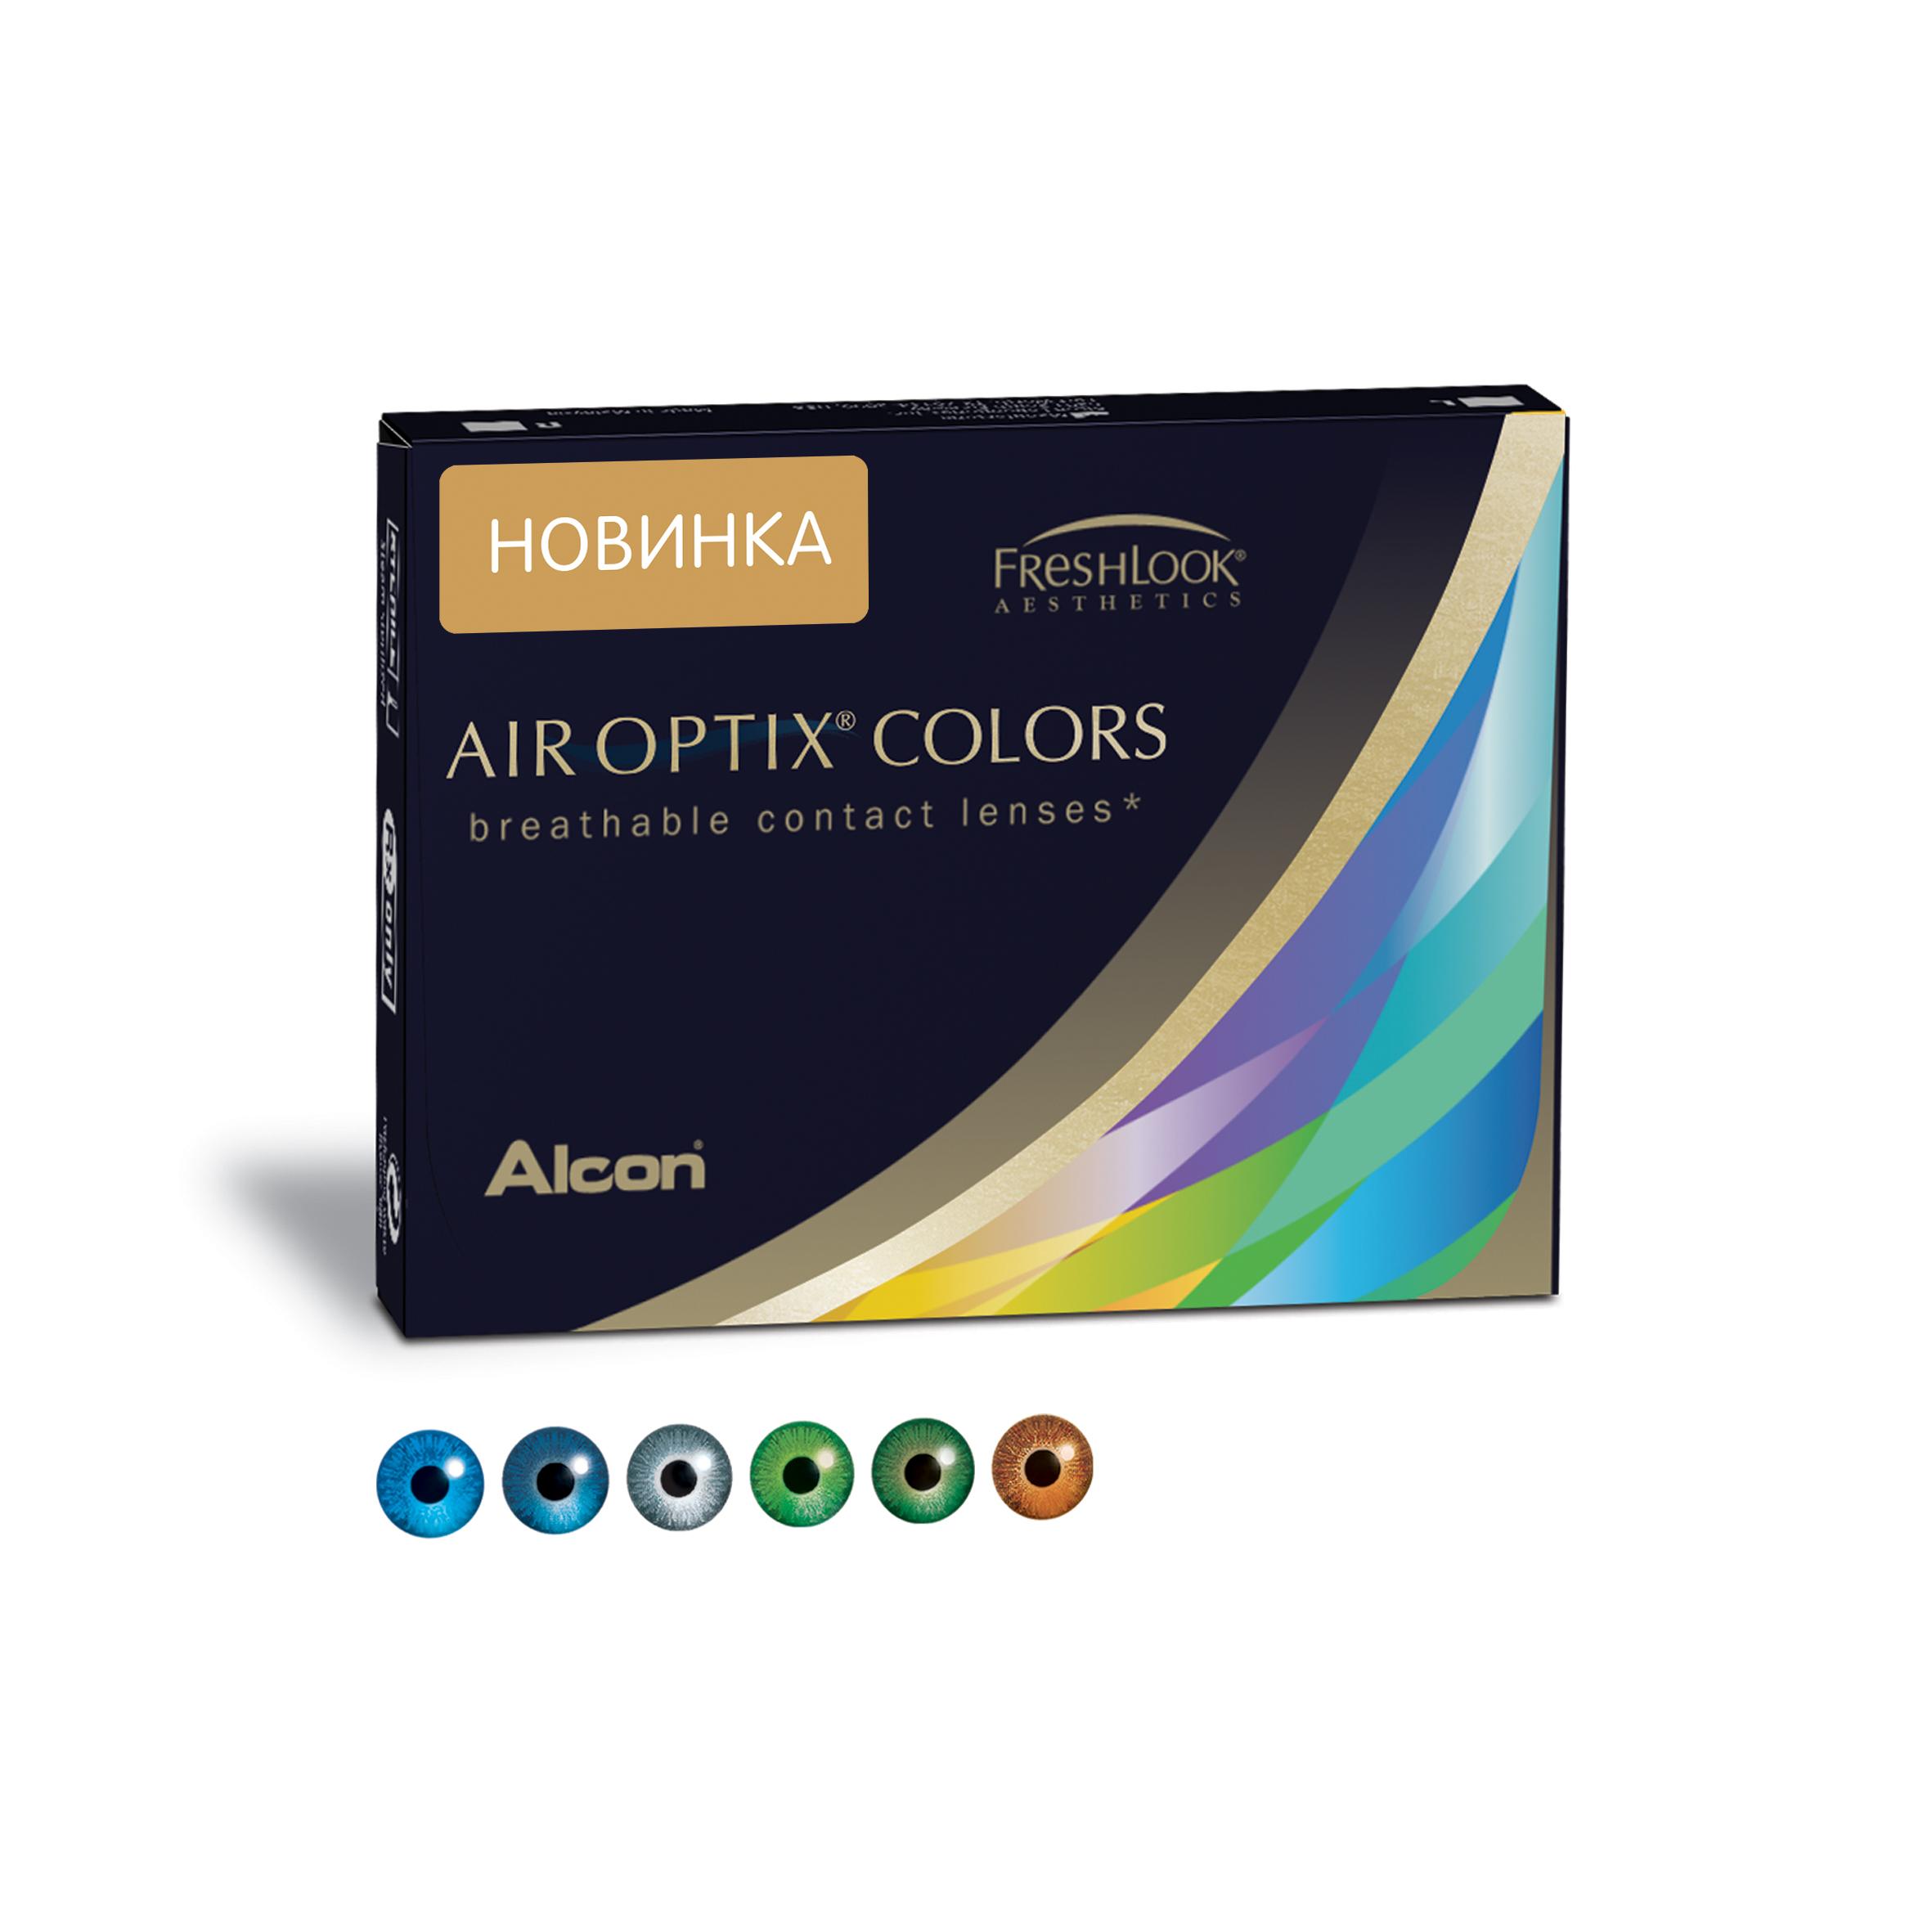 Аlcon контактные линзы Air Optix Colors 2 шт -1.25 Gemstone Green31746133Мягкие контактные линзы